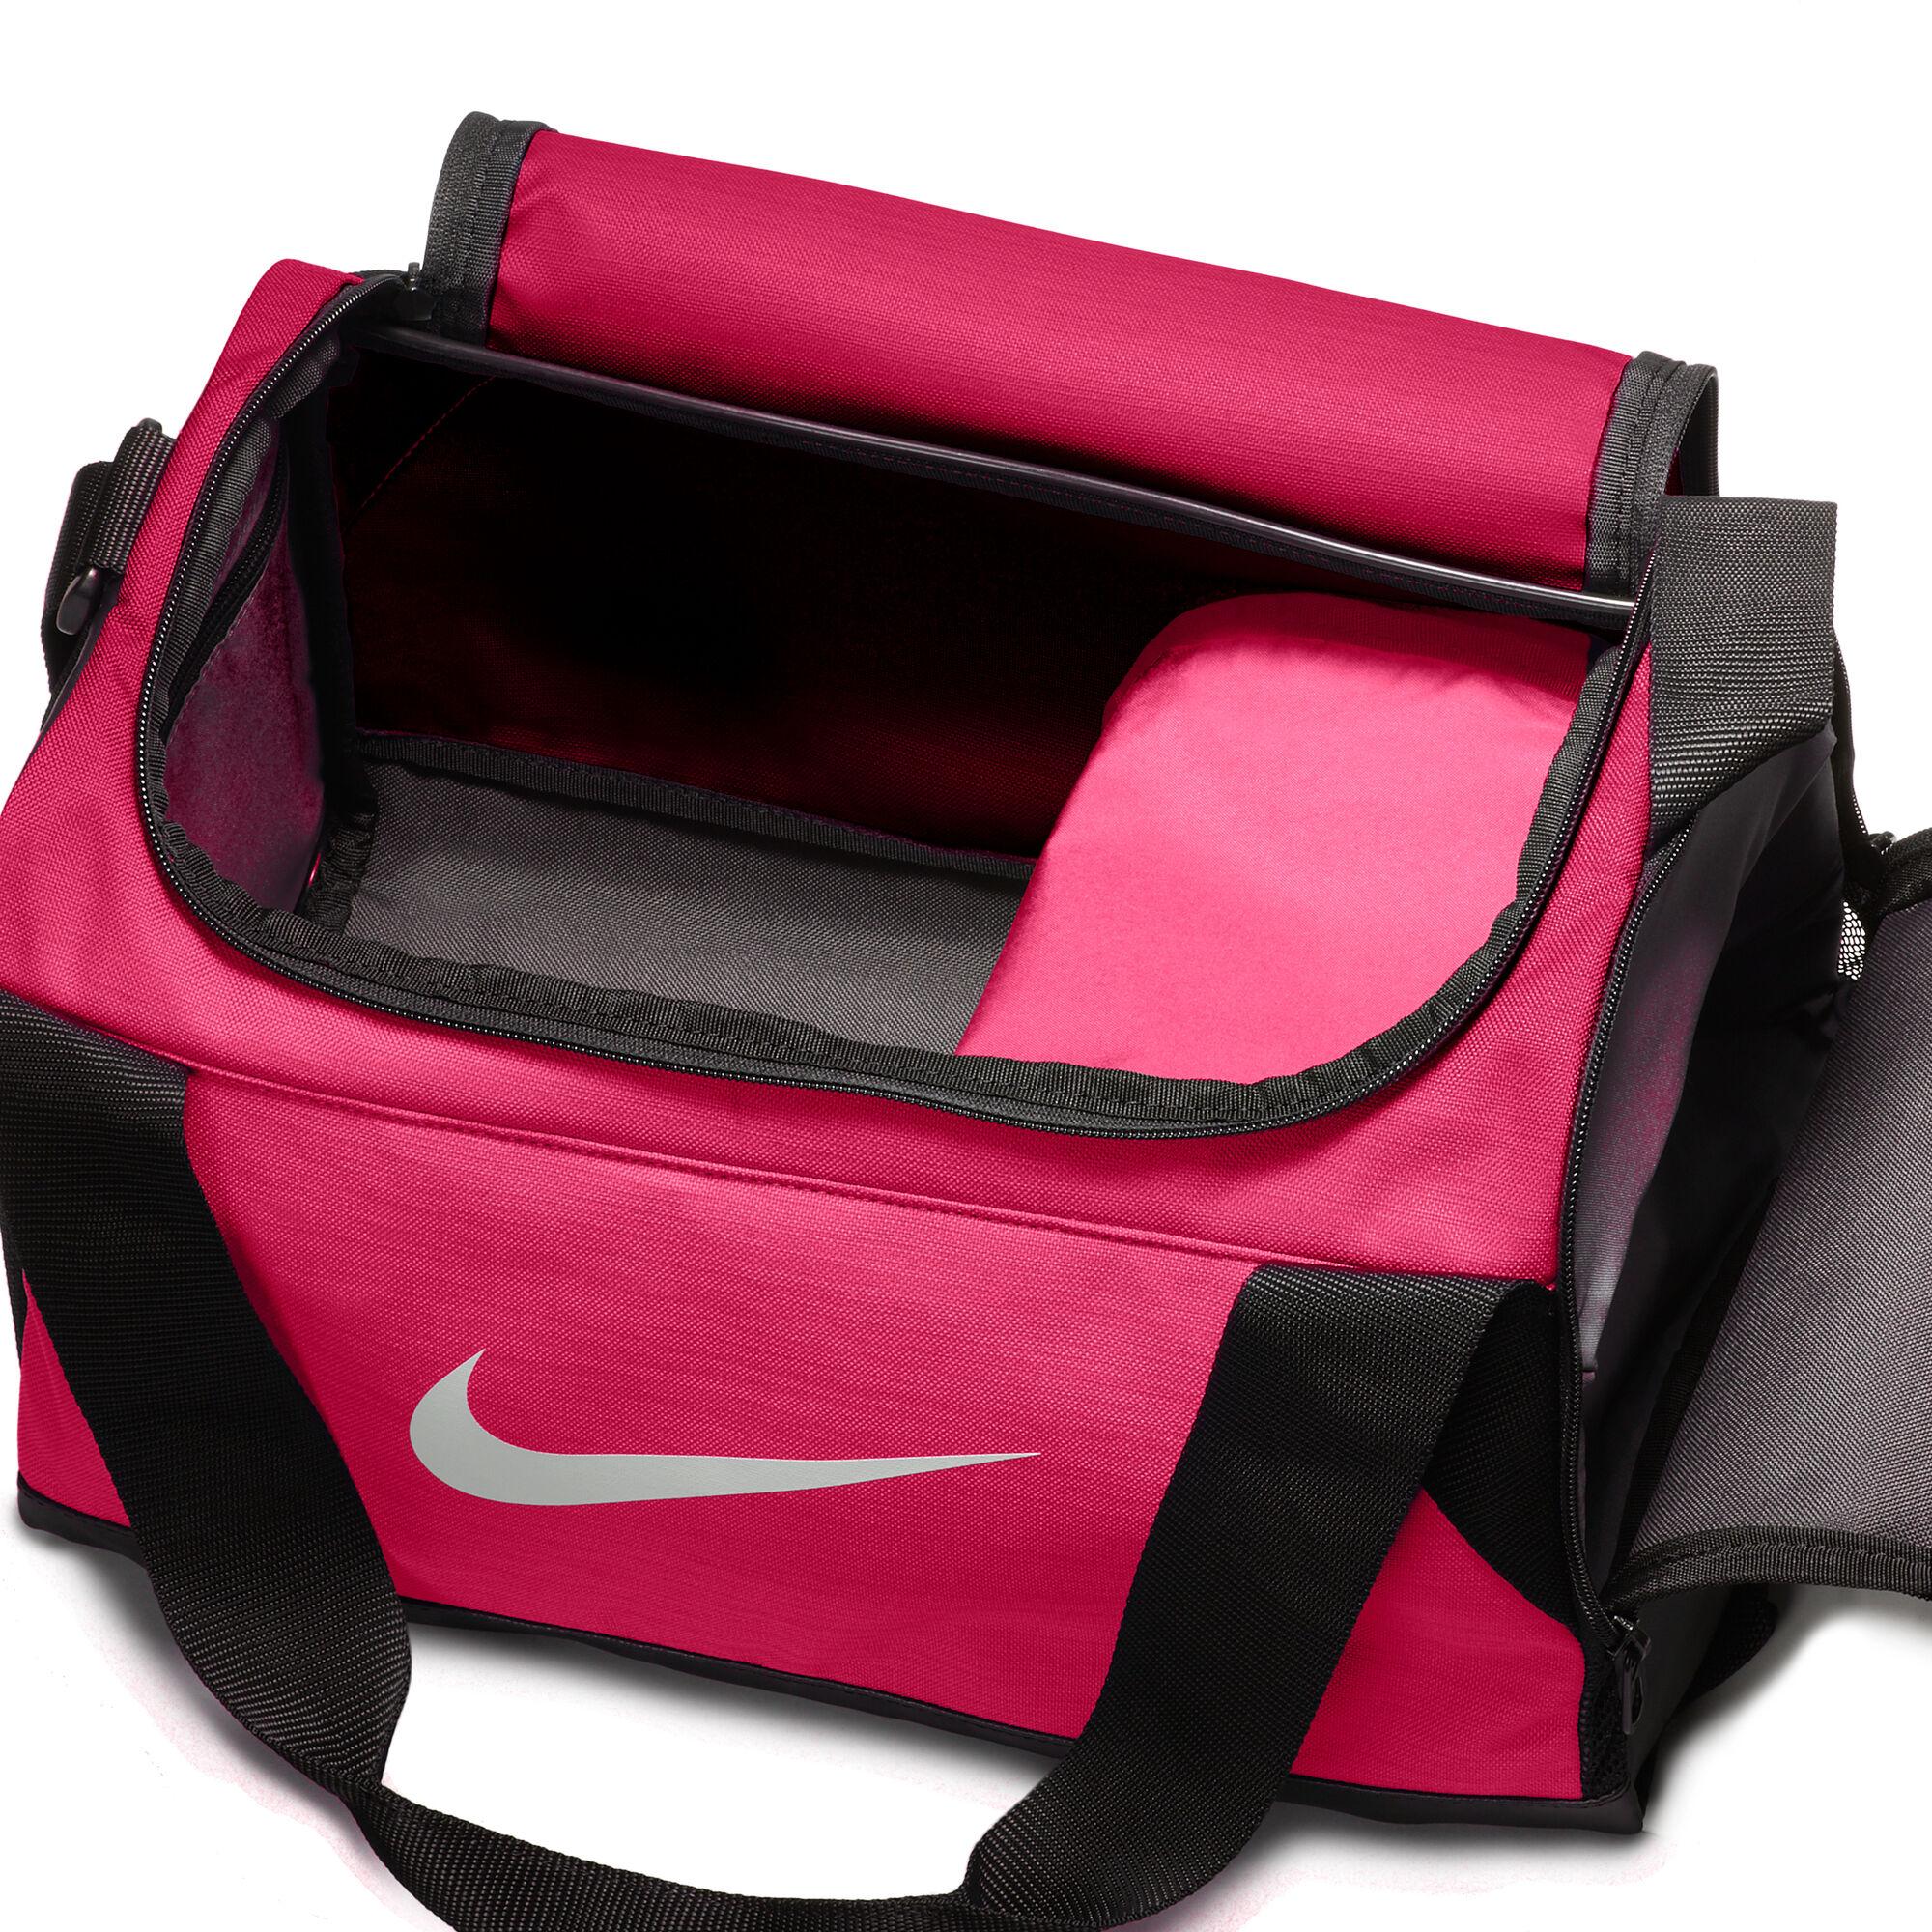 buy Nike Brasilia Duffel Extra Small Sports Bag XS - Pink, Black ... 820ec01287